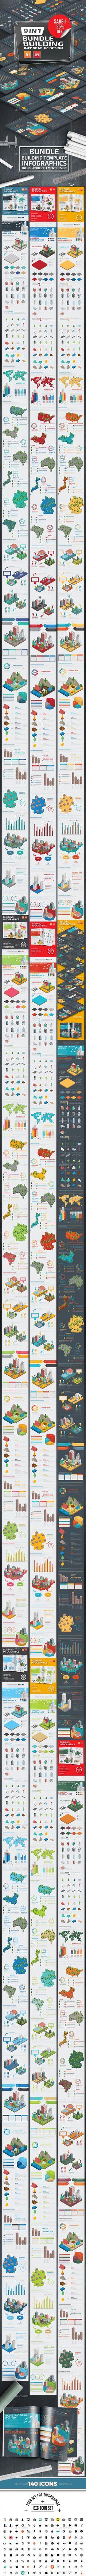 Bundle Building Infographics Design Template Vector EPS, AI Illustrator